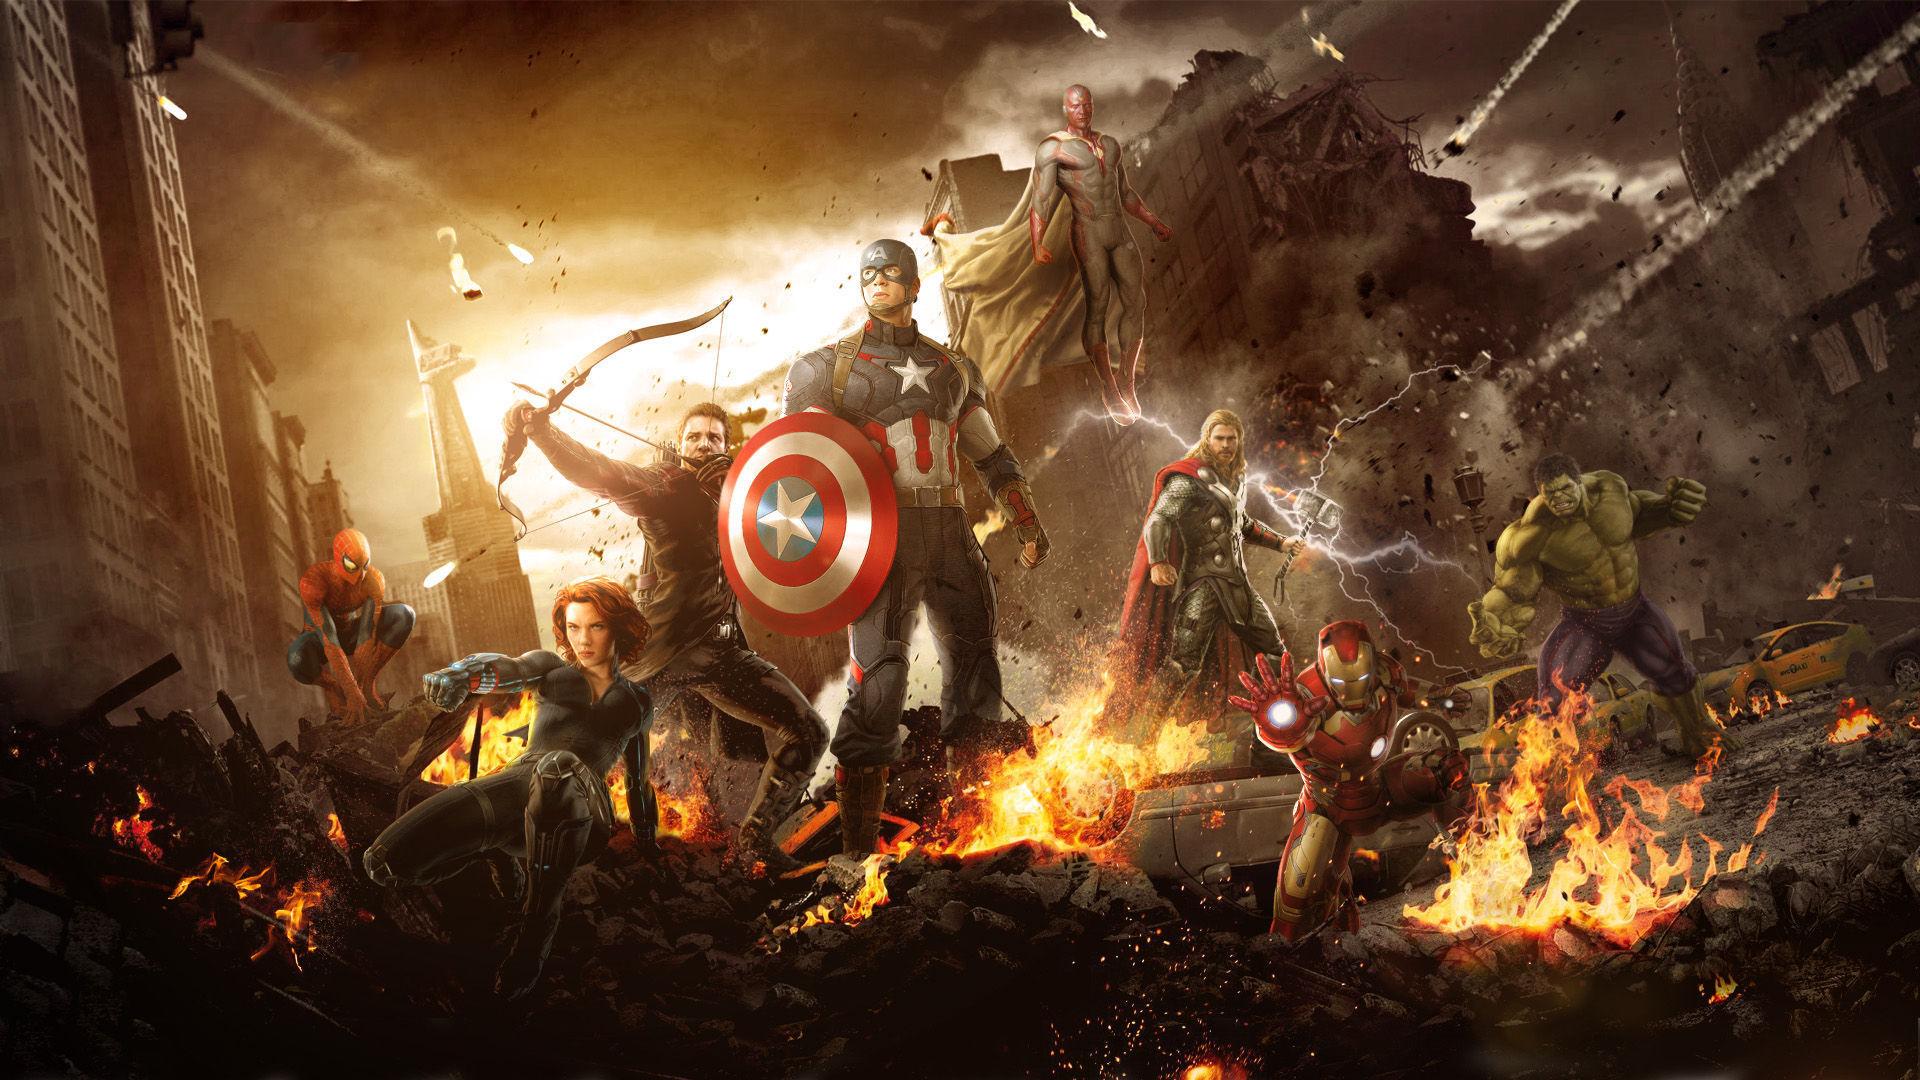 Fonds Décran Avengers Lère Dultron Maximumwall